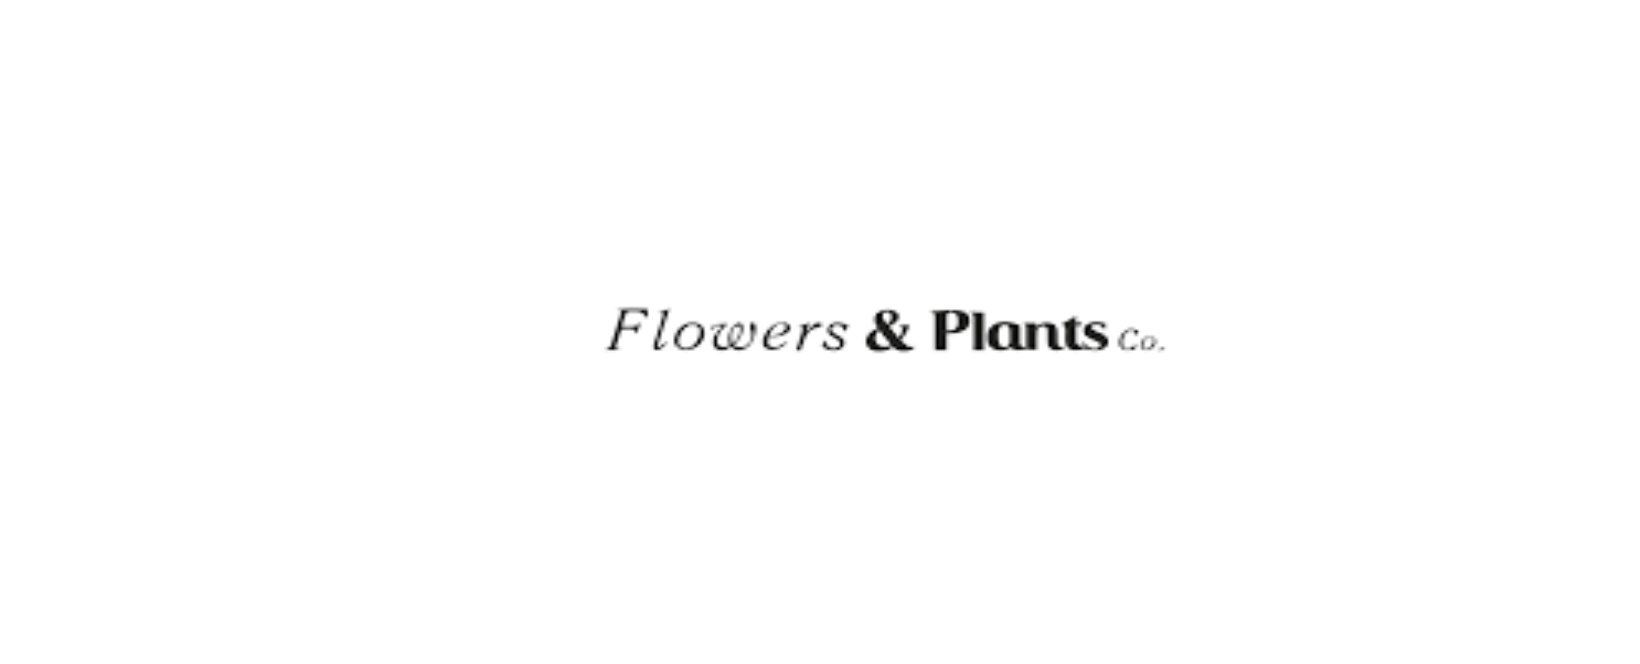 Flowers & Plants Co. UK Discount Code 2021